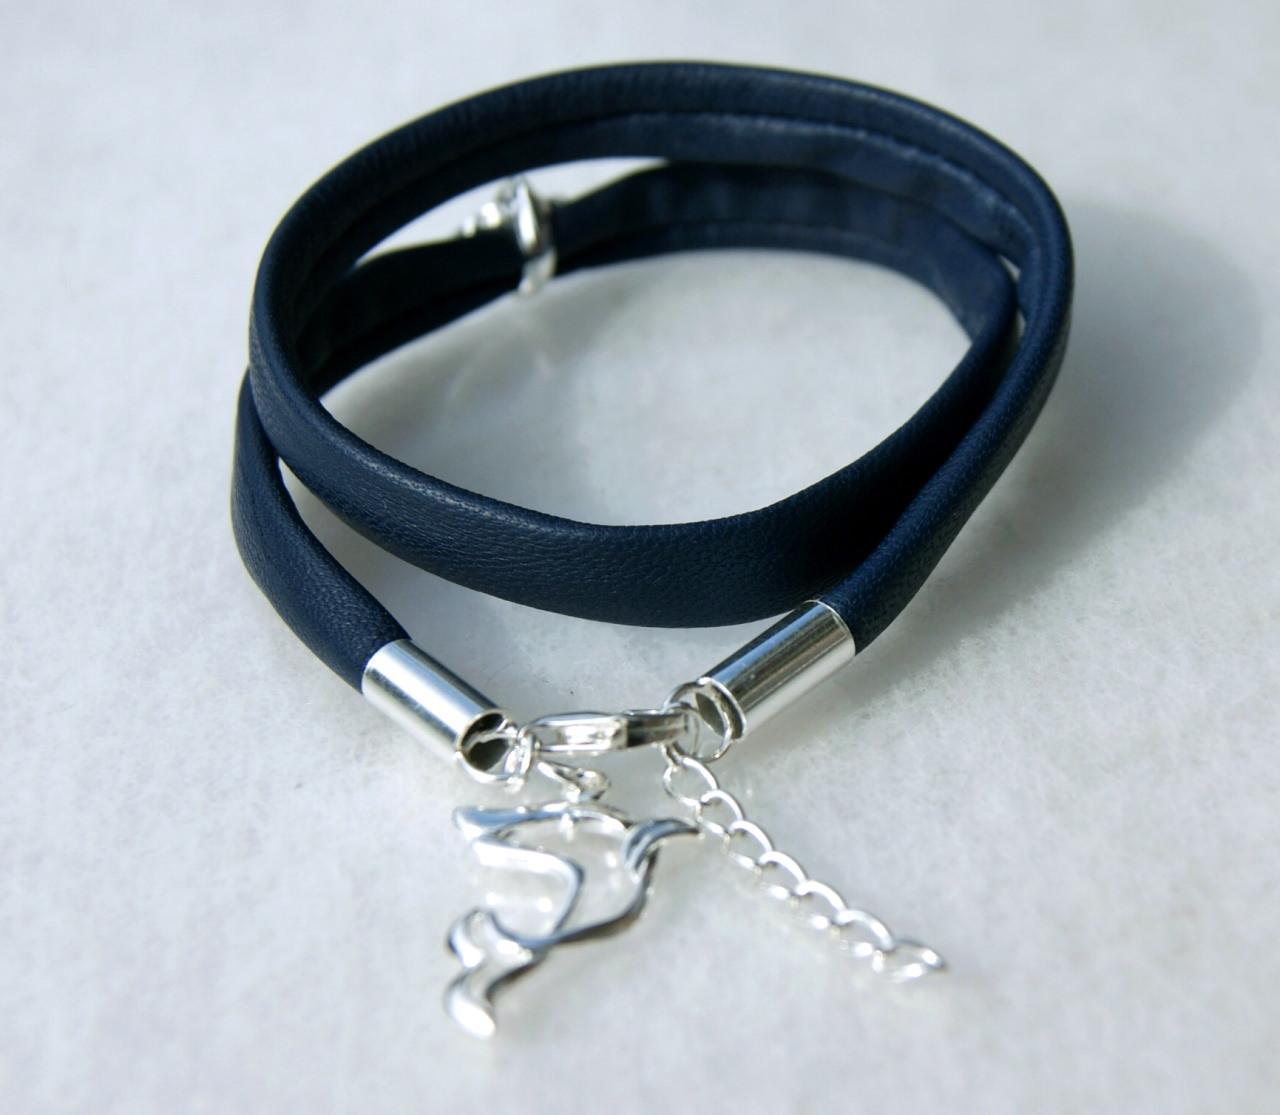 -  Wickelarmband DELPHIN  Nappa-Leder Silber -  Wickelarmband DELPHIN  Nappa-Leder Silber